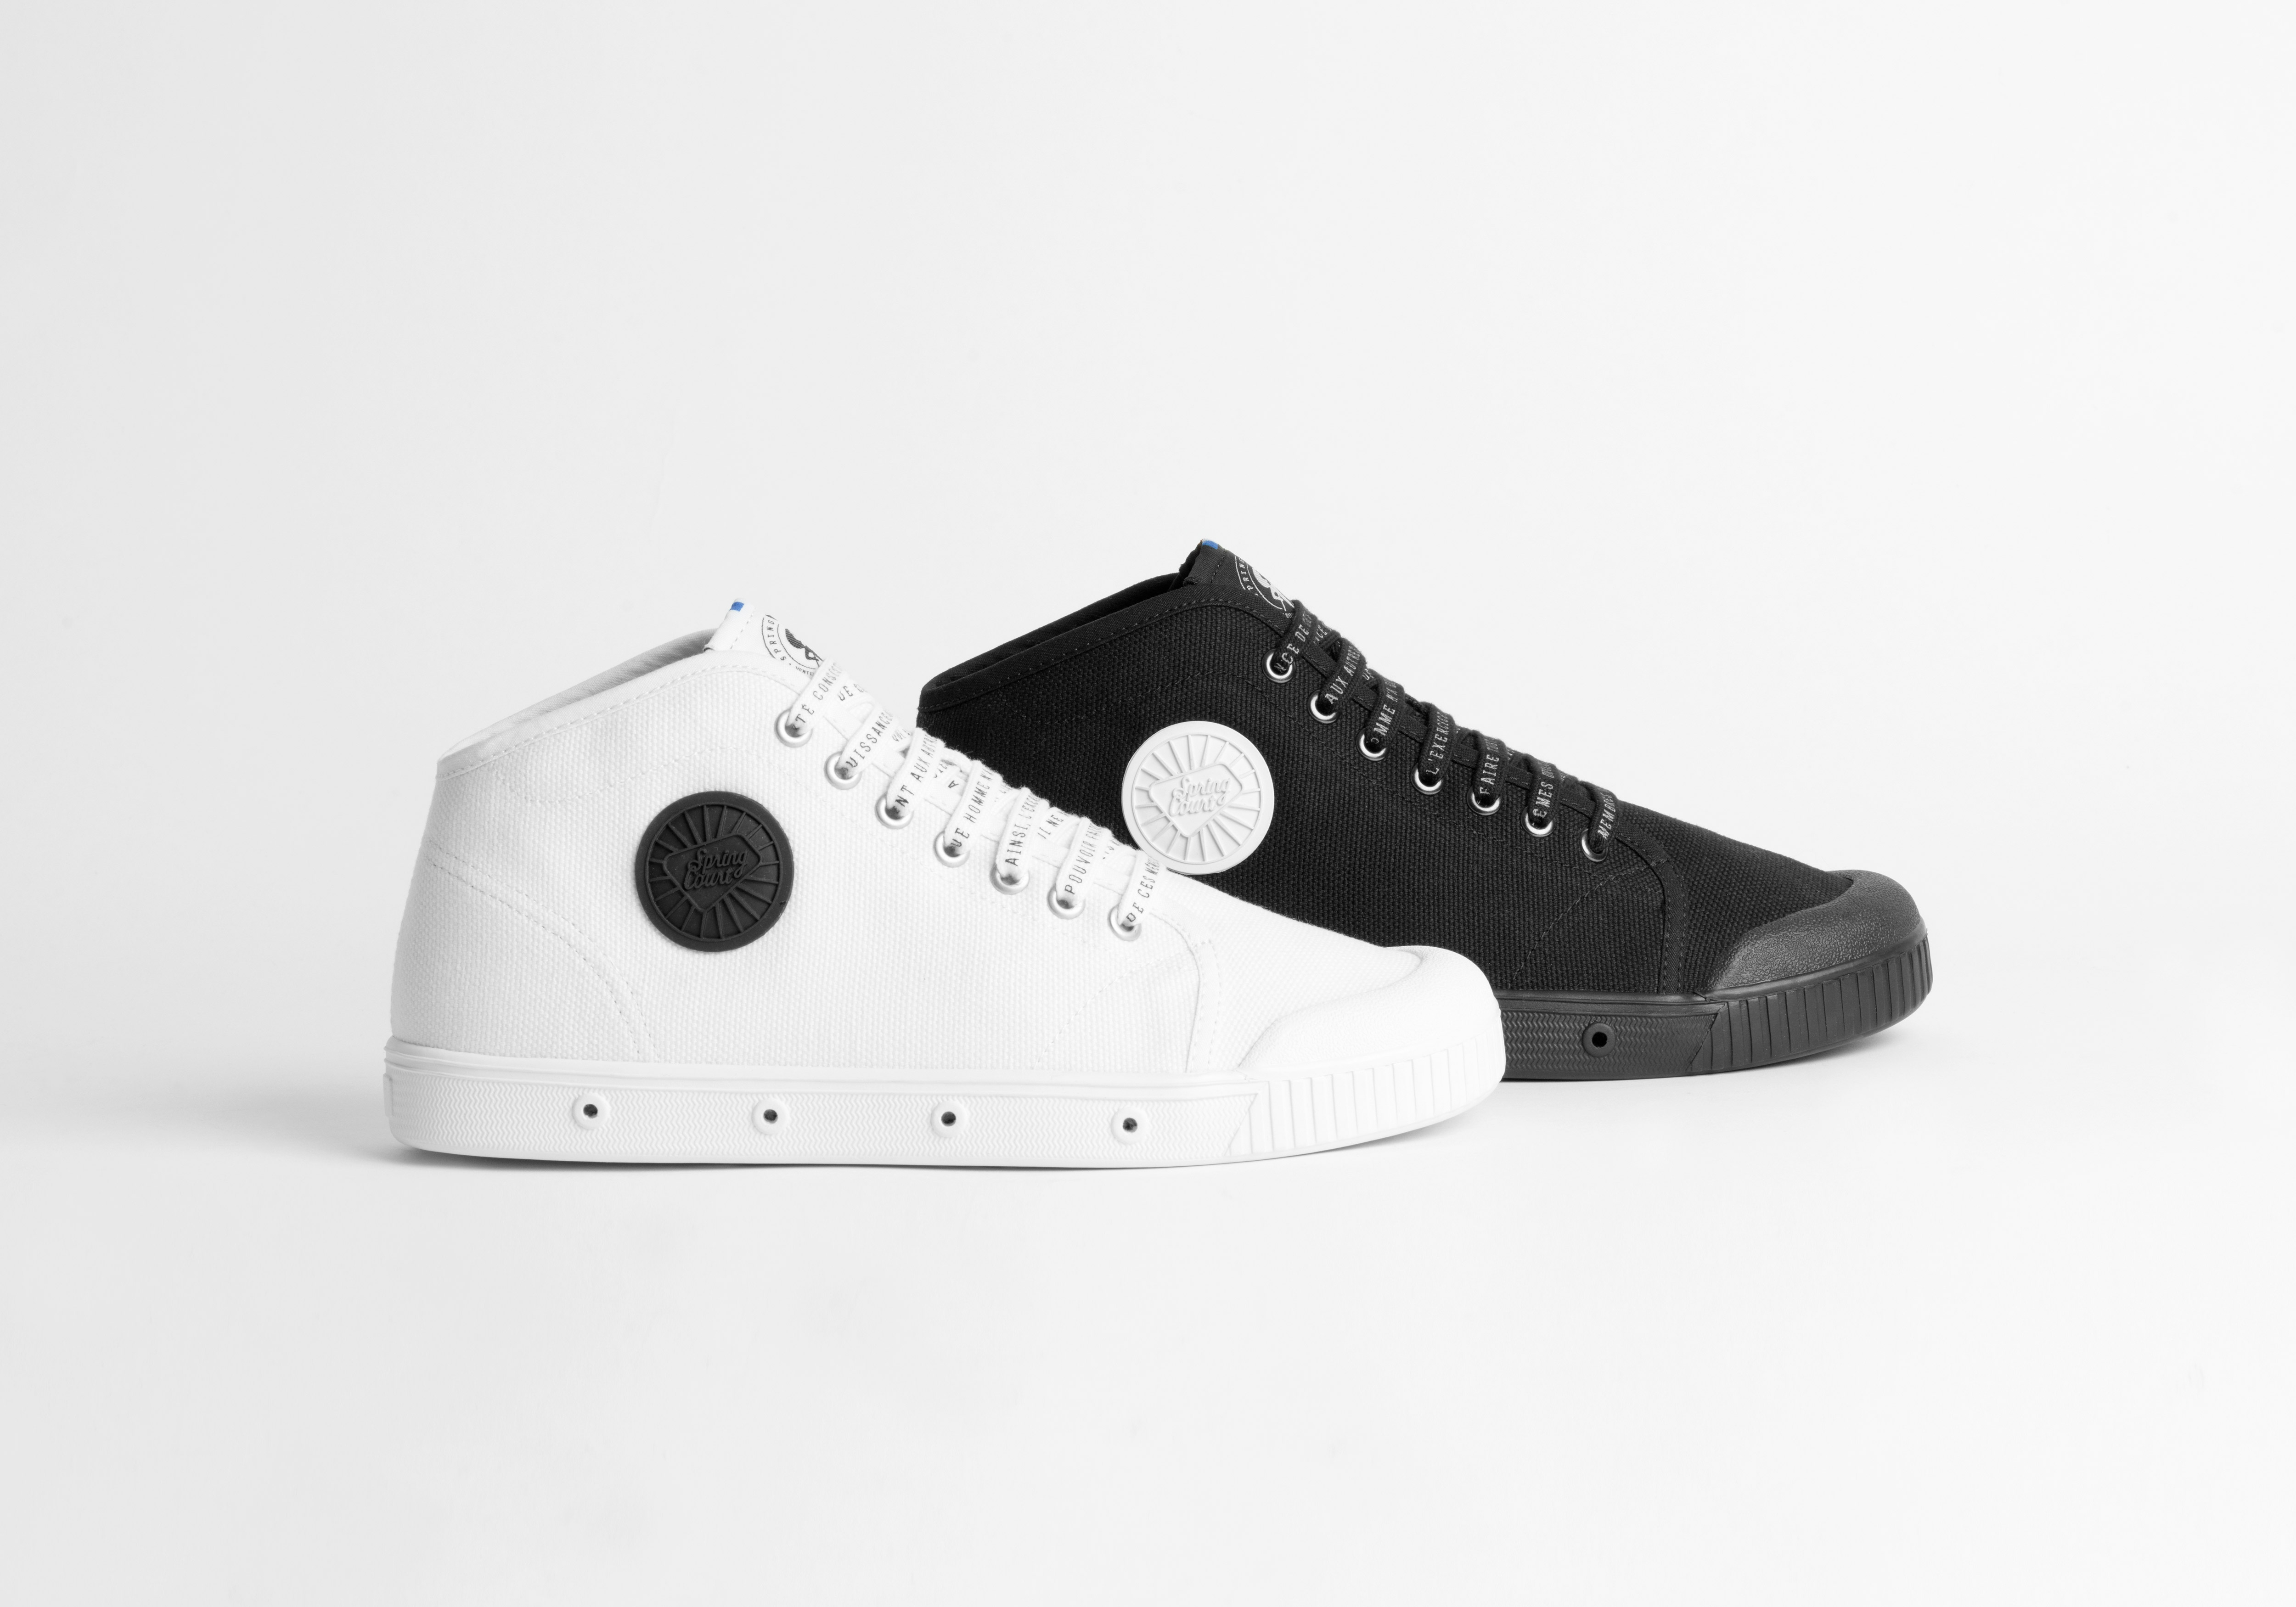 B2 Black and white